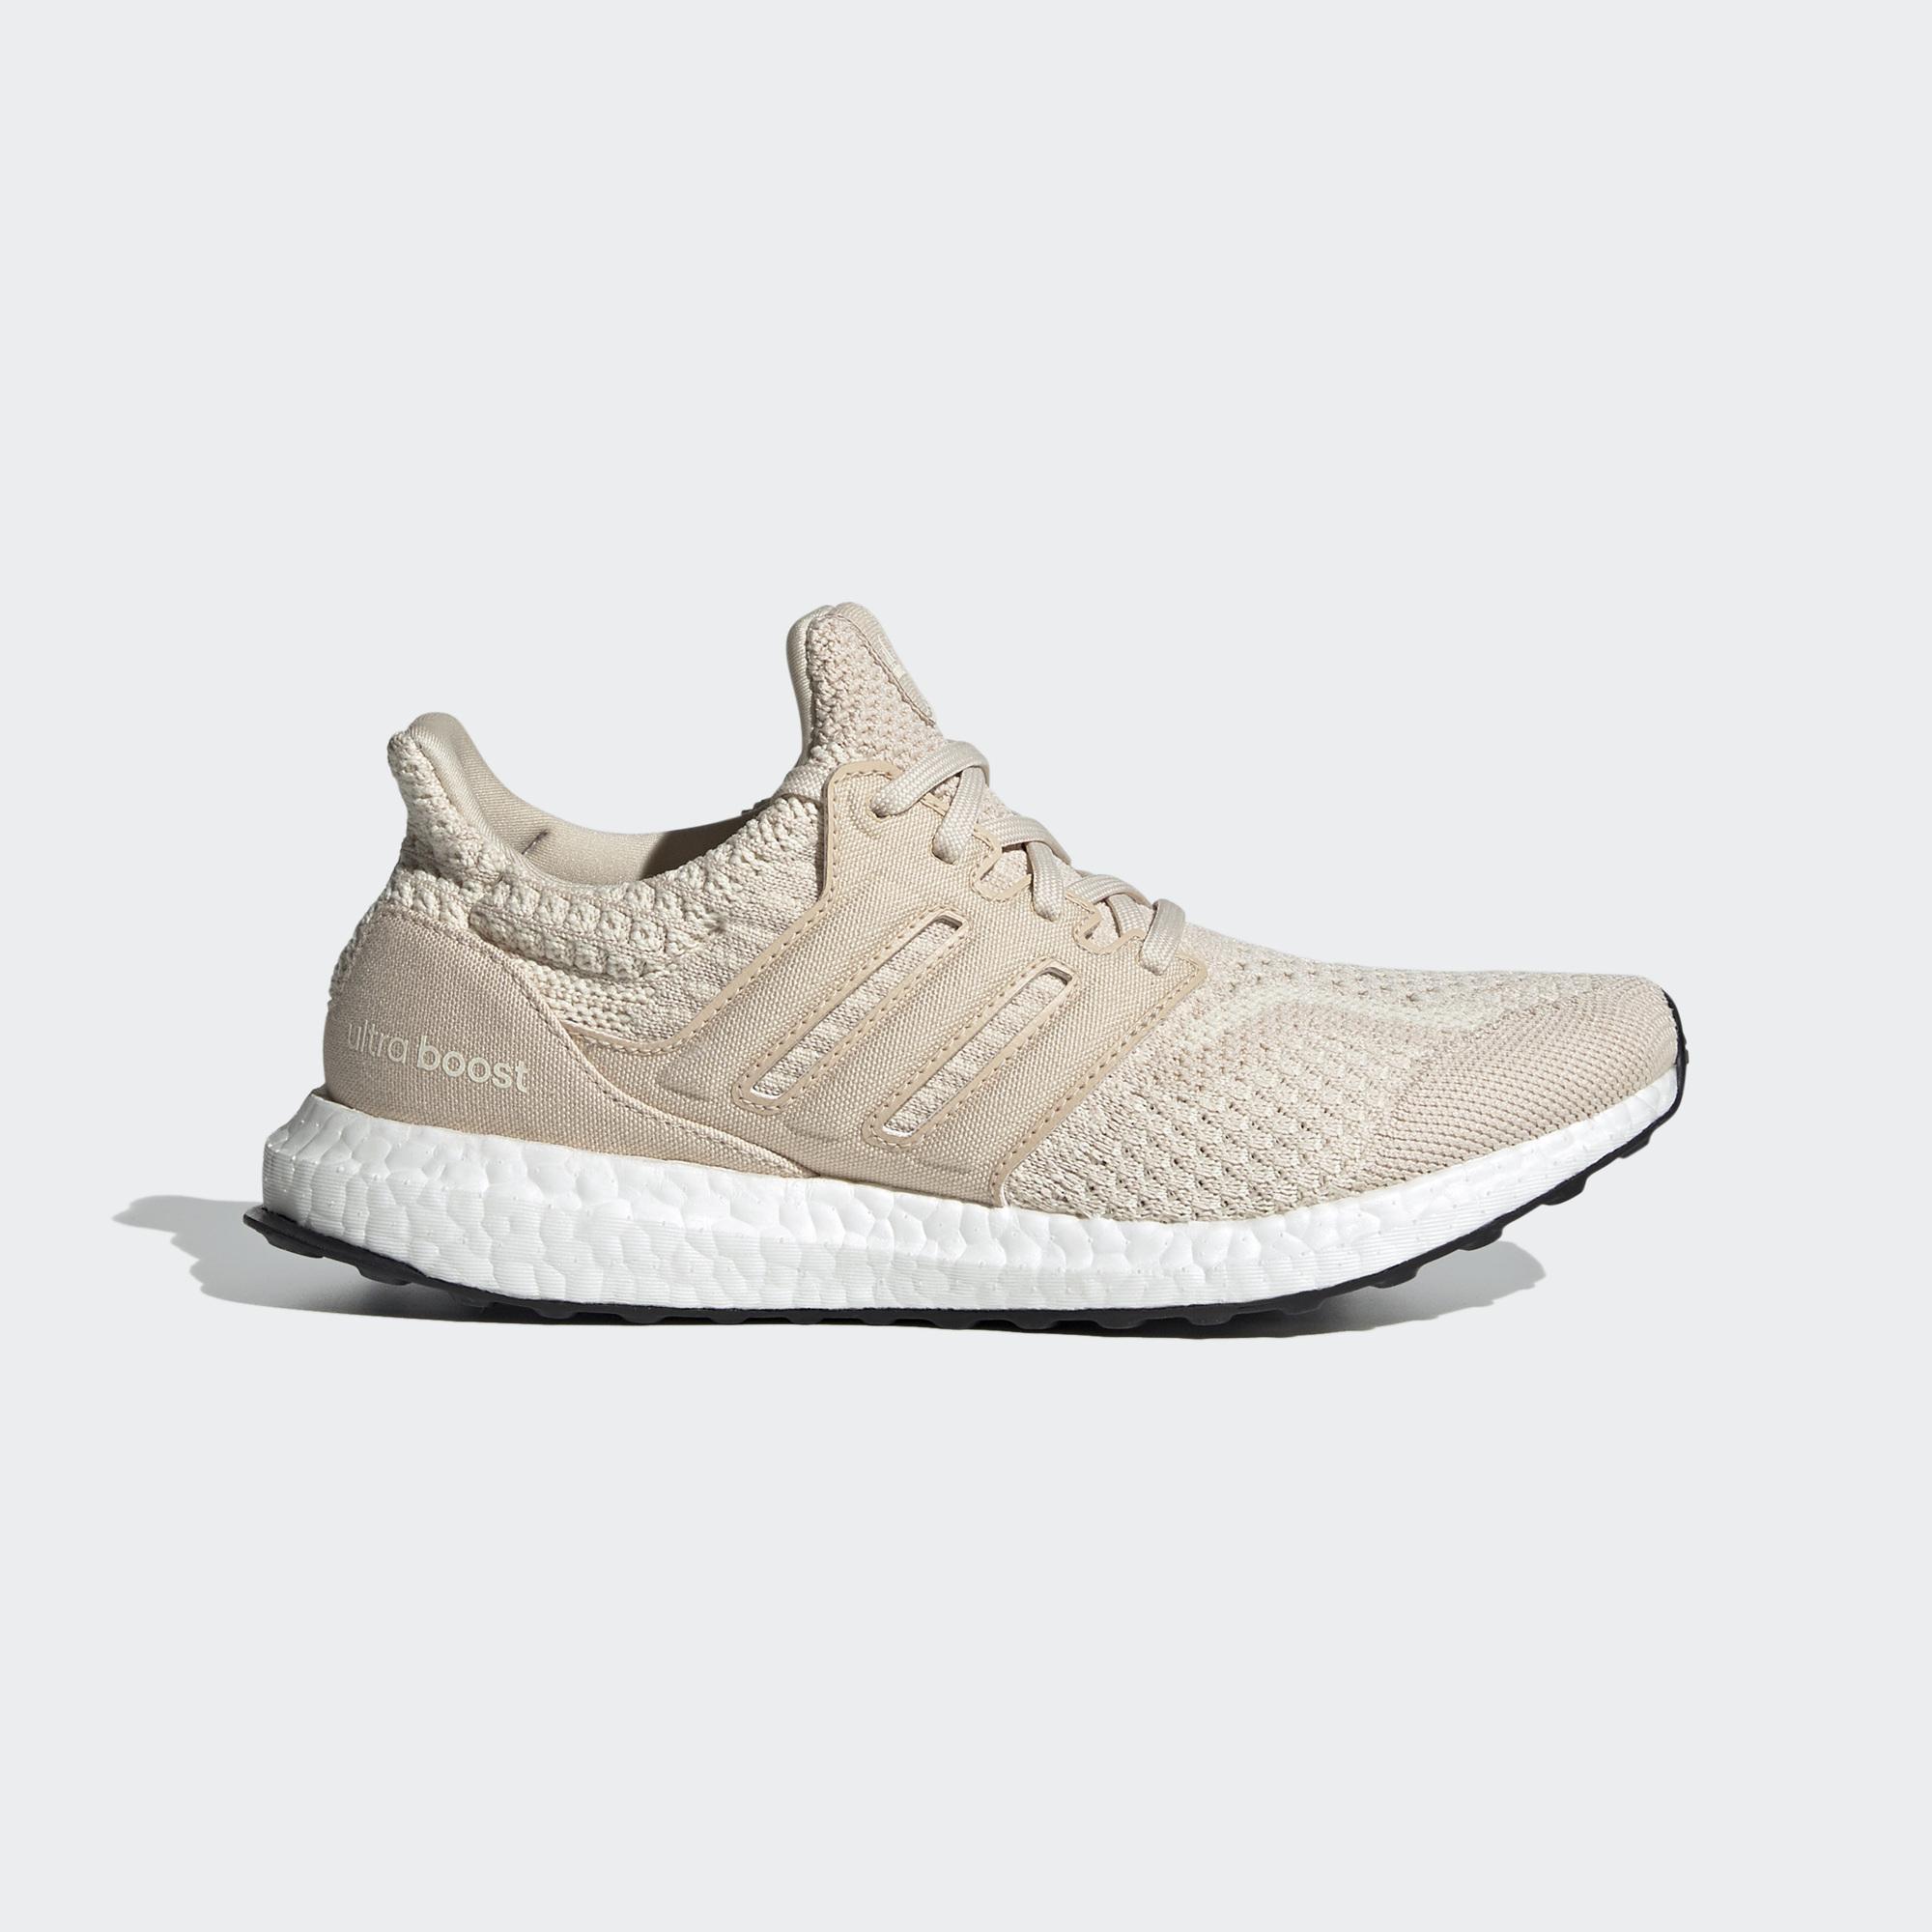 Ultraboost 5.0 DNA 跑鞋